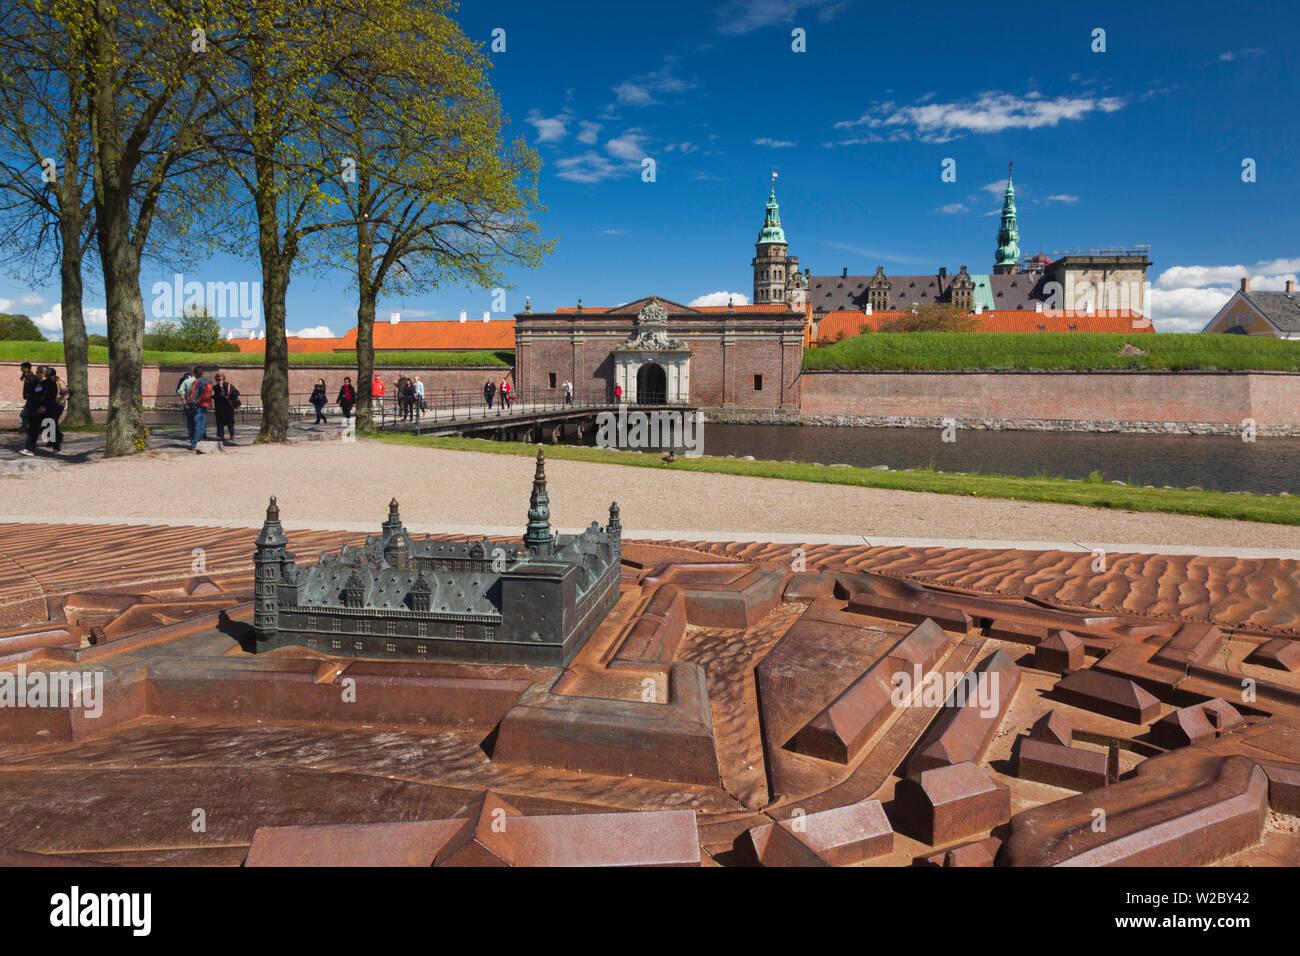 Denmark, Zealand, Helsingor, Kronborg Castle, also known as Elsinore Castle, from Shakespeare's Hamlet, outdoor scale model - Stock Image